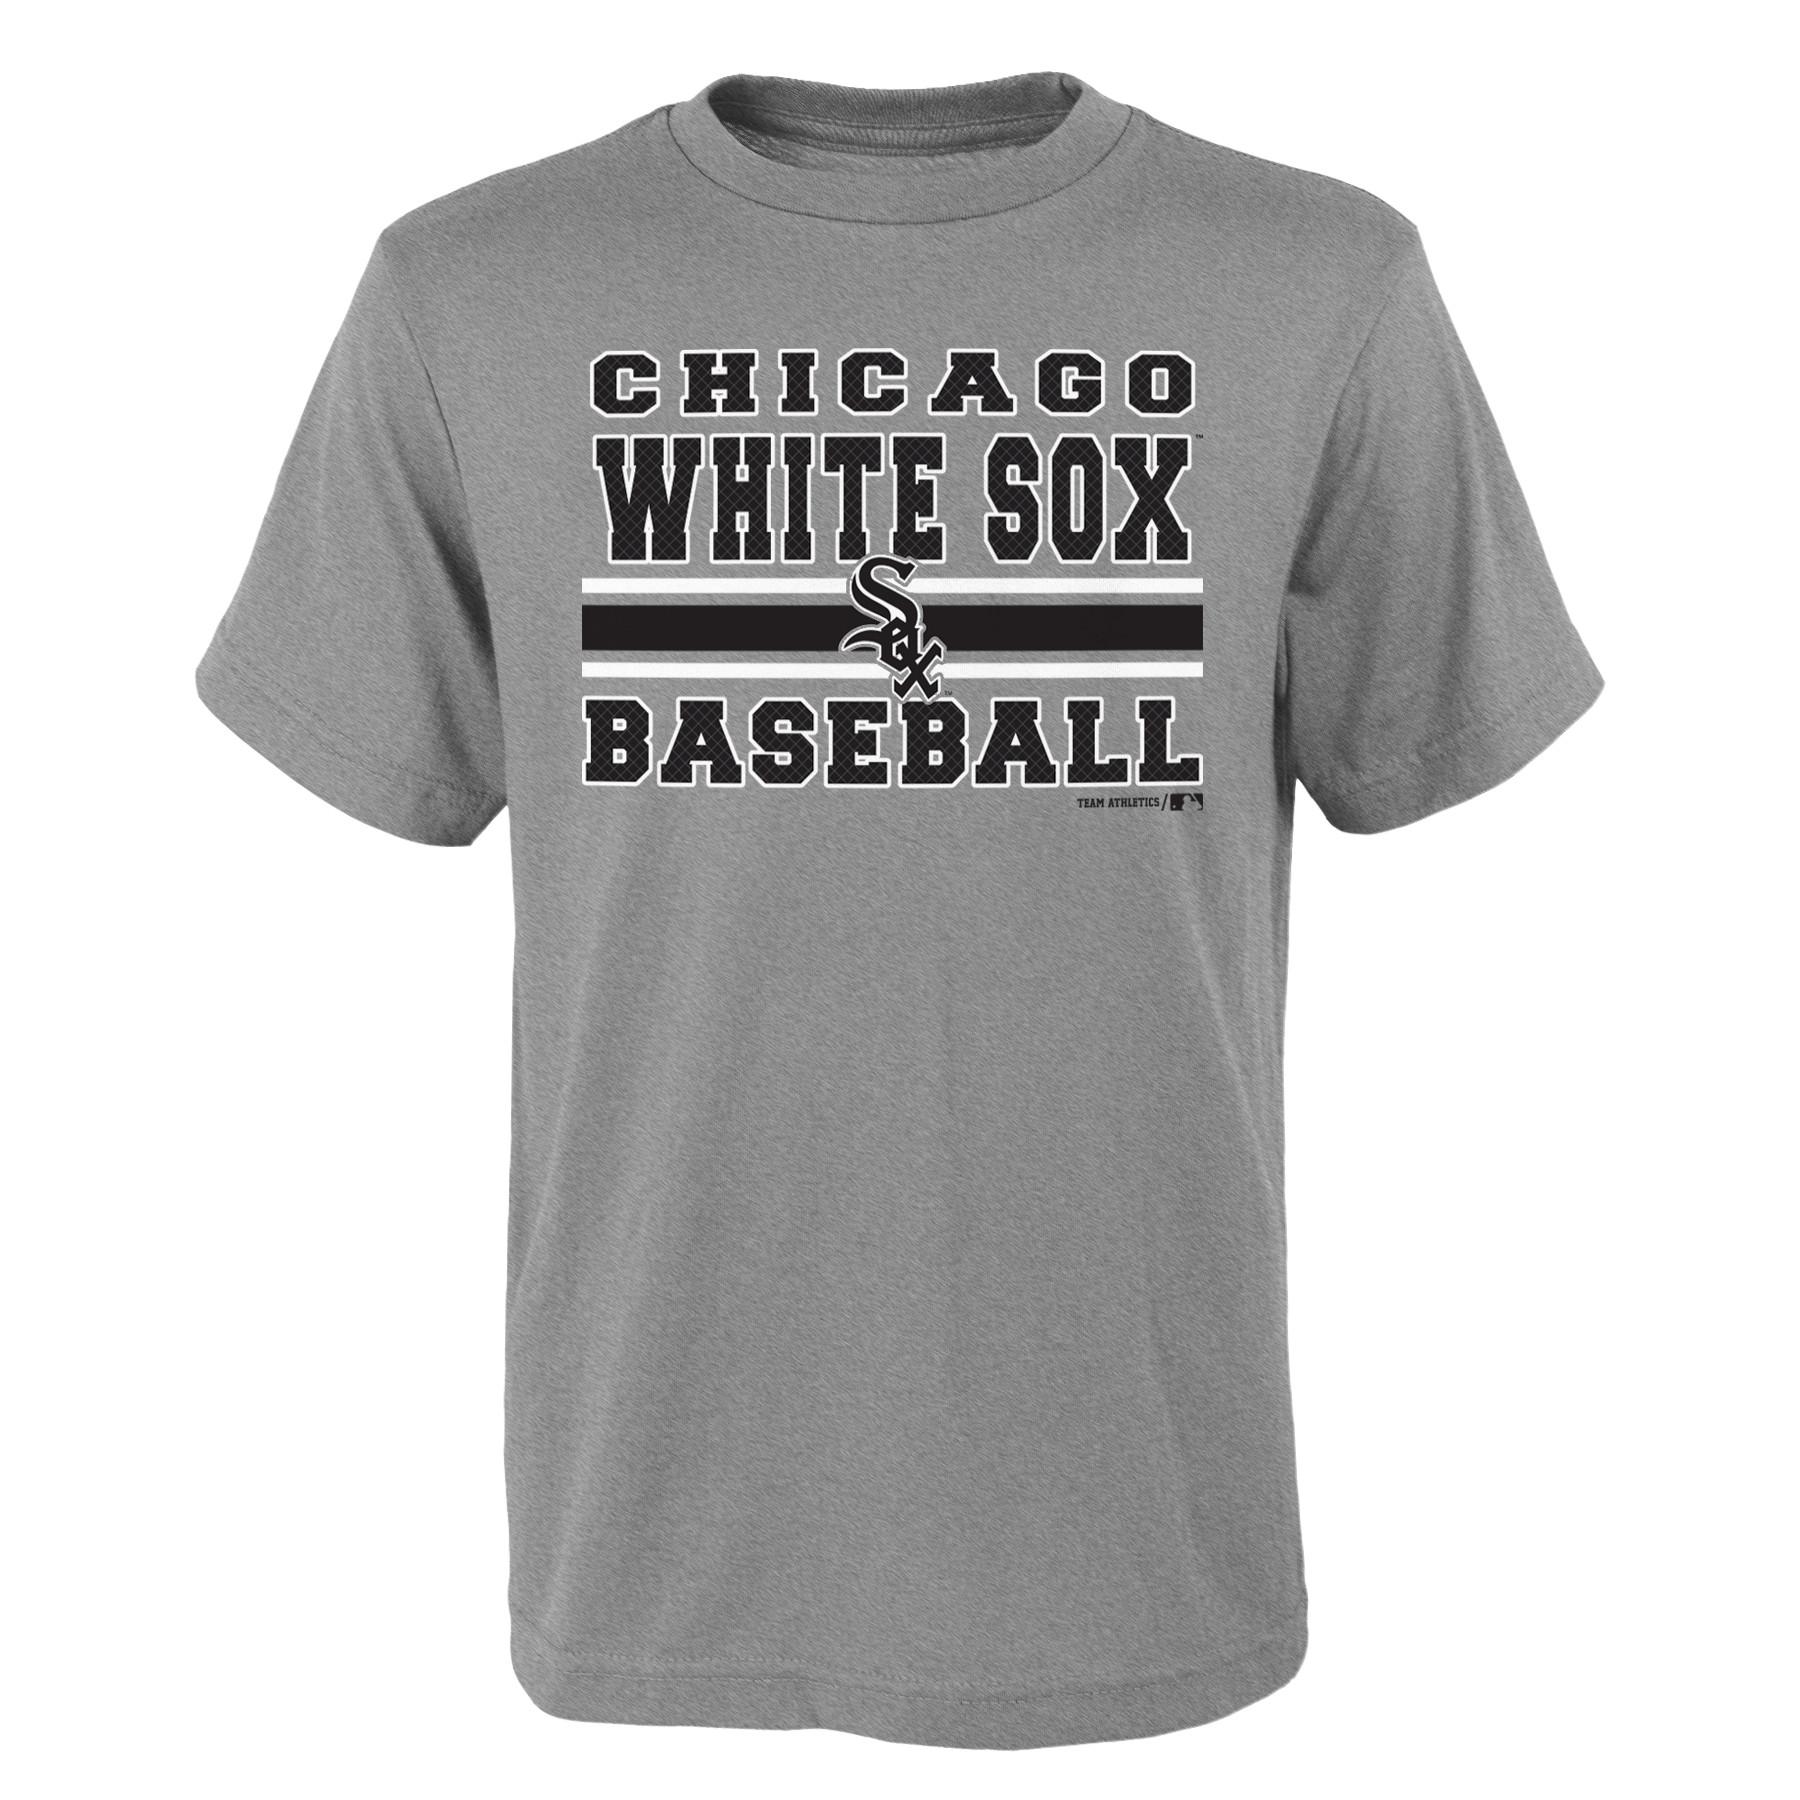 MLB Chicago WHITE SOX TEE Short Sleeve Boys OPP 90% Cotton 10% Polyester Gray Team Tee 4-18